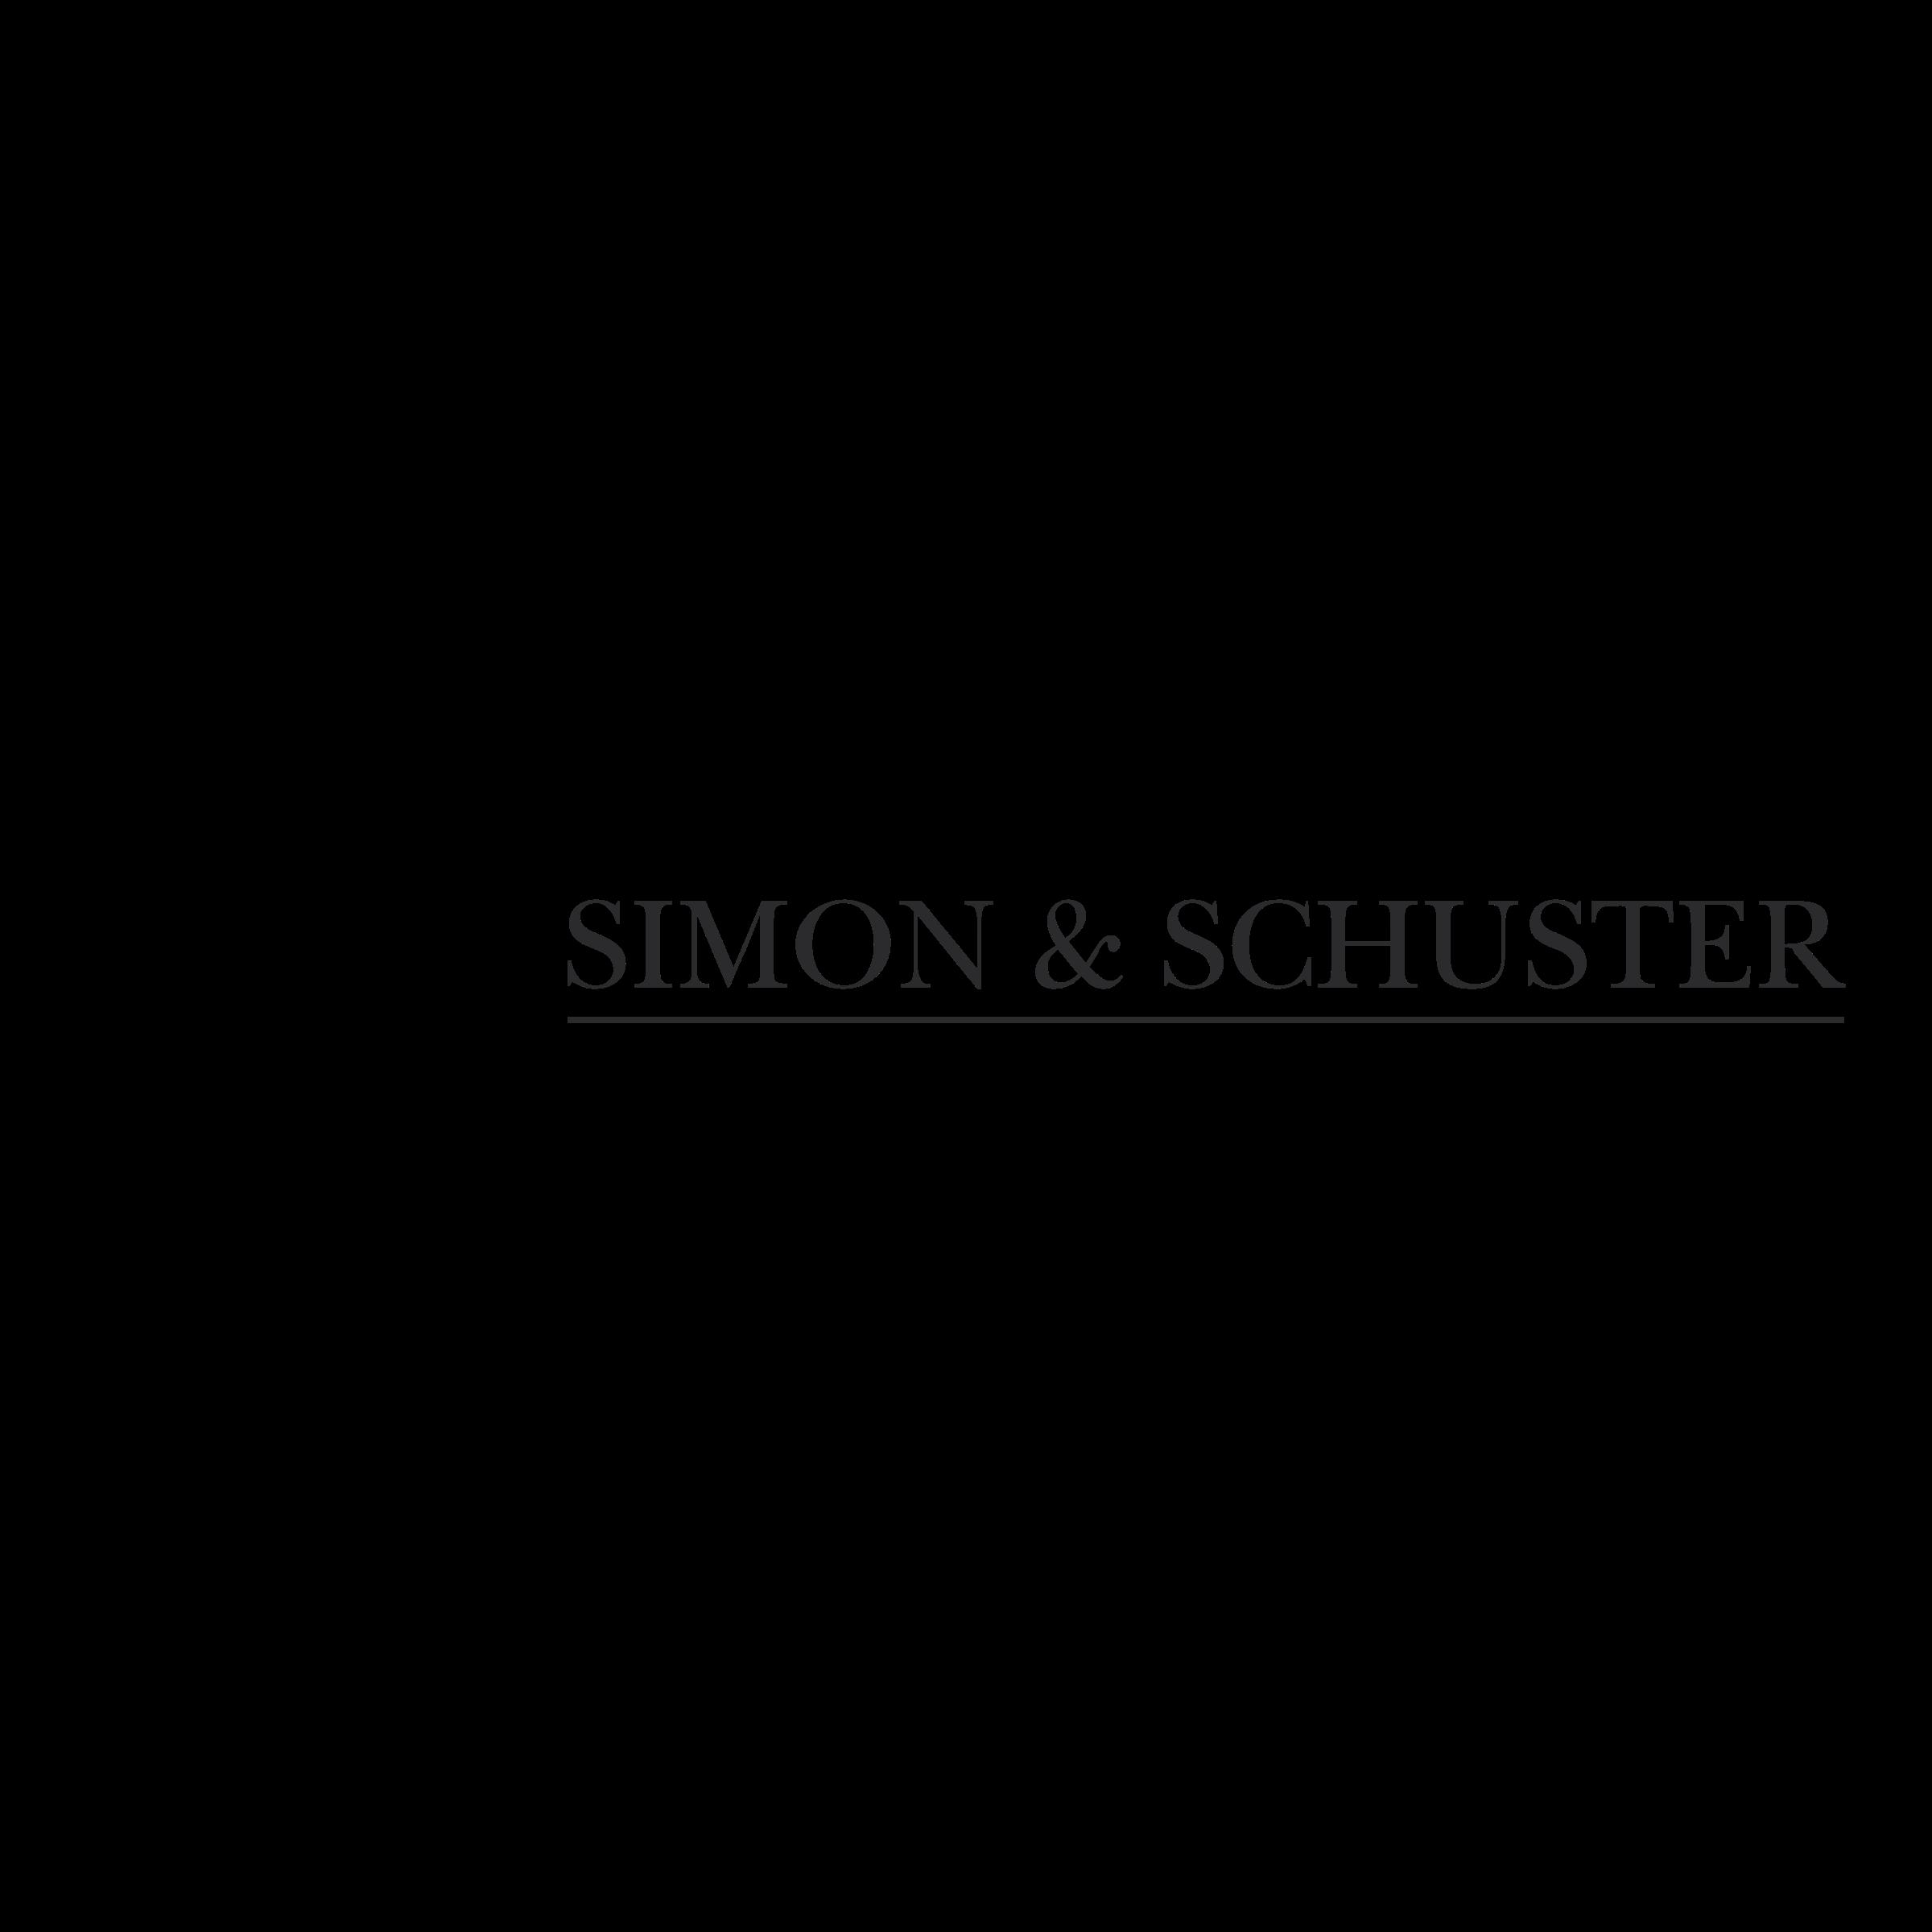 simon-schuster-logo-png-transparent.png